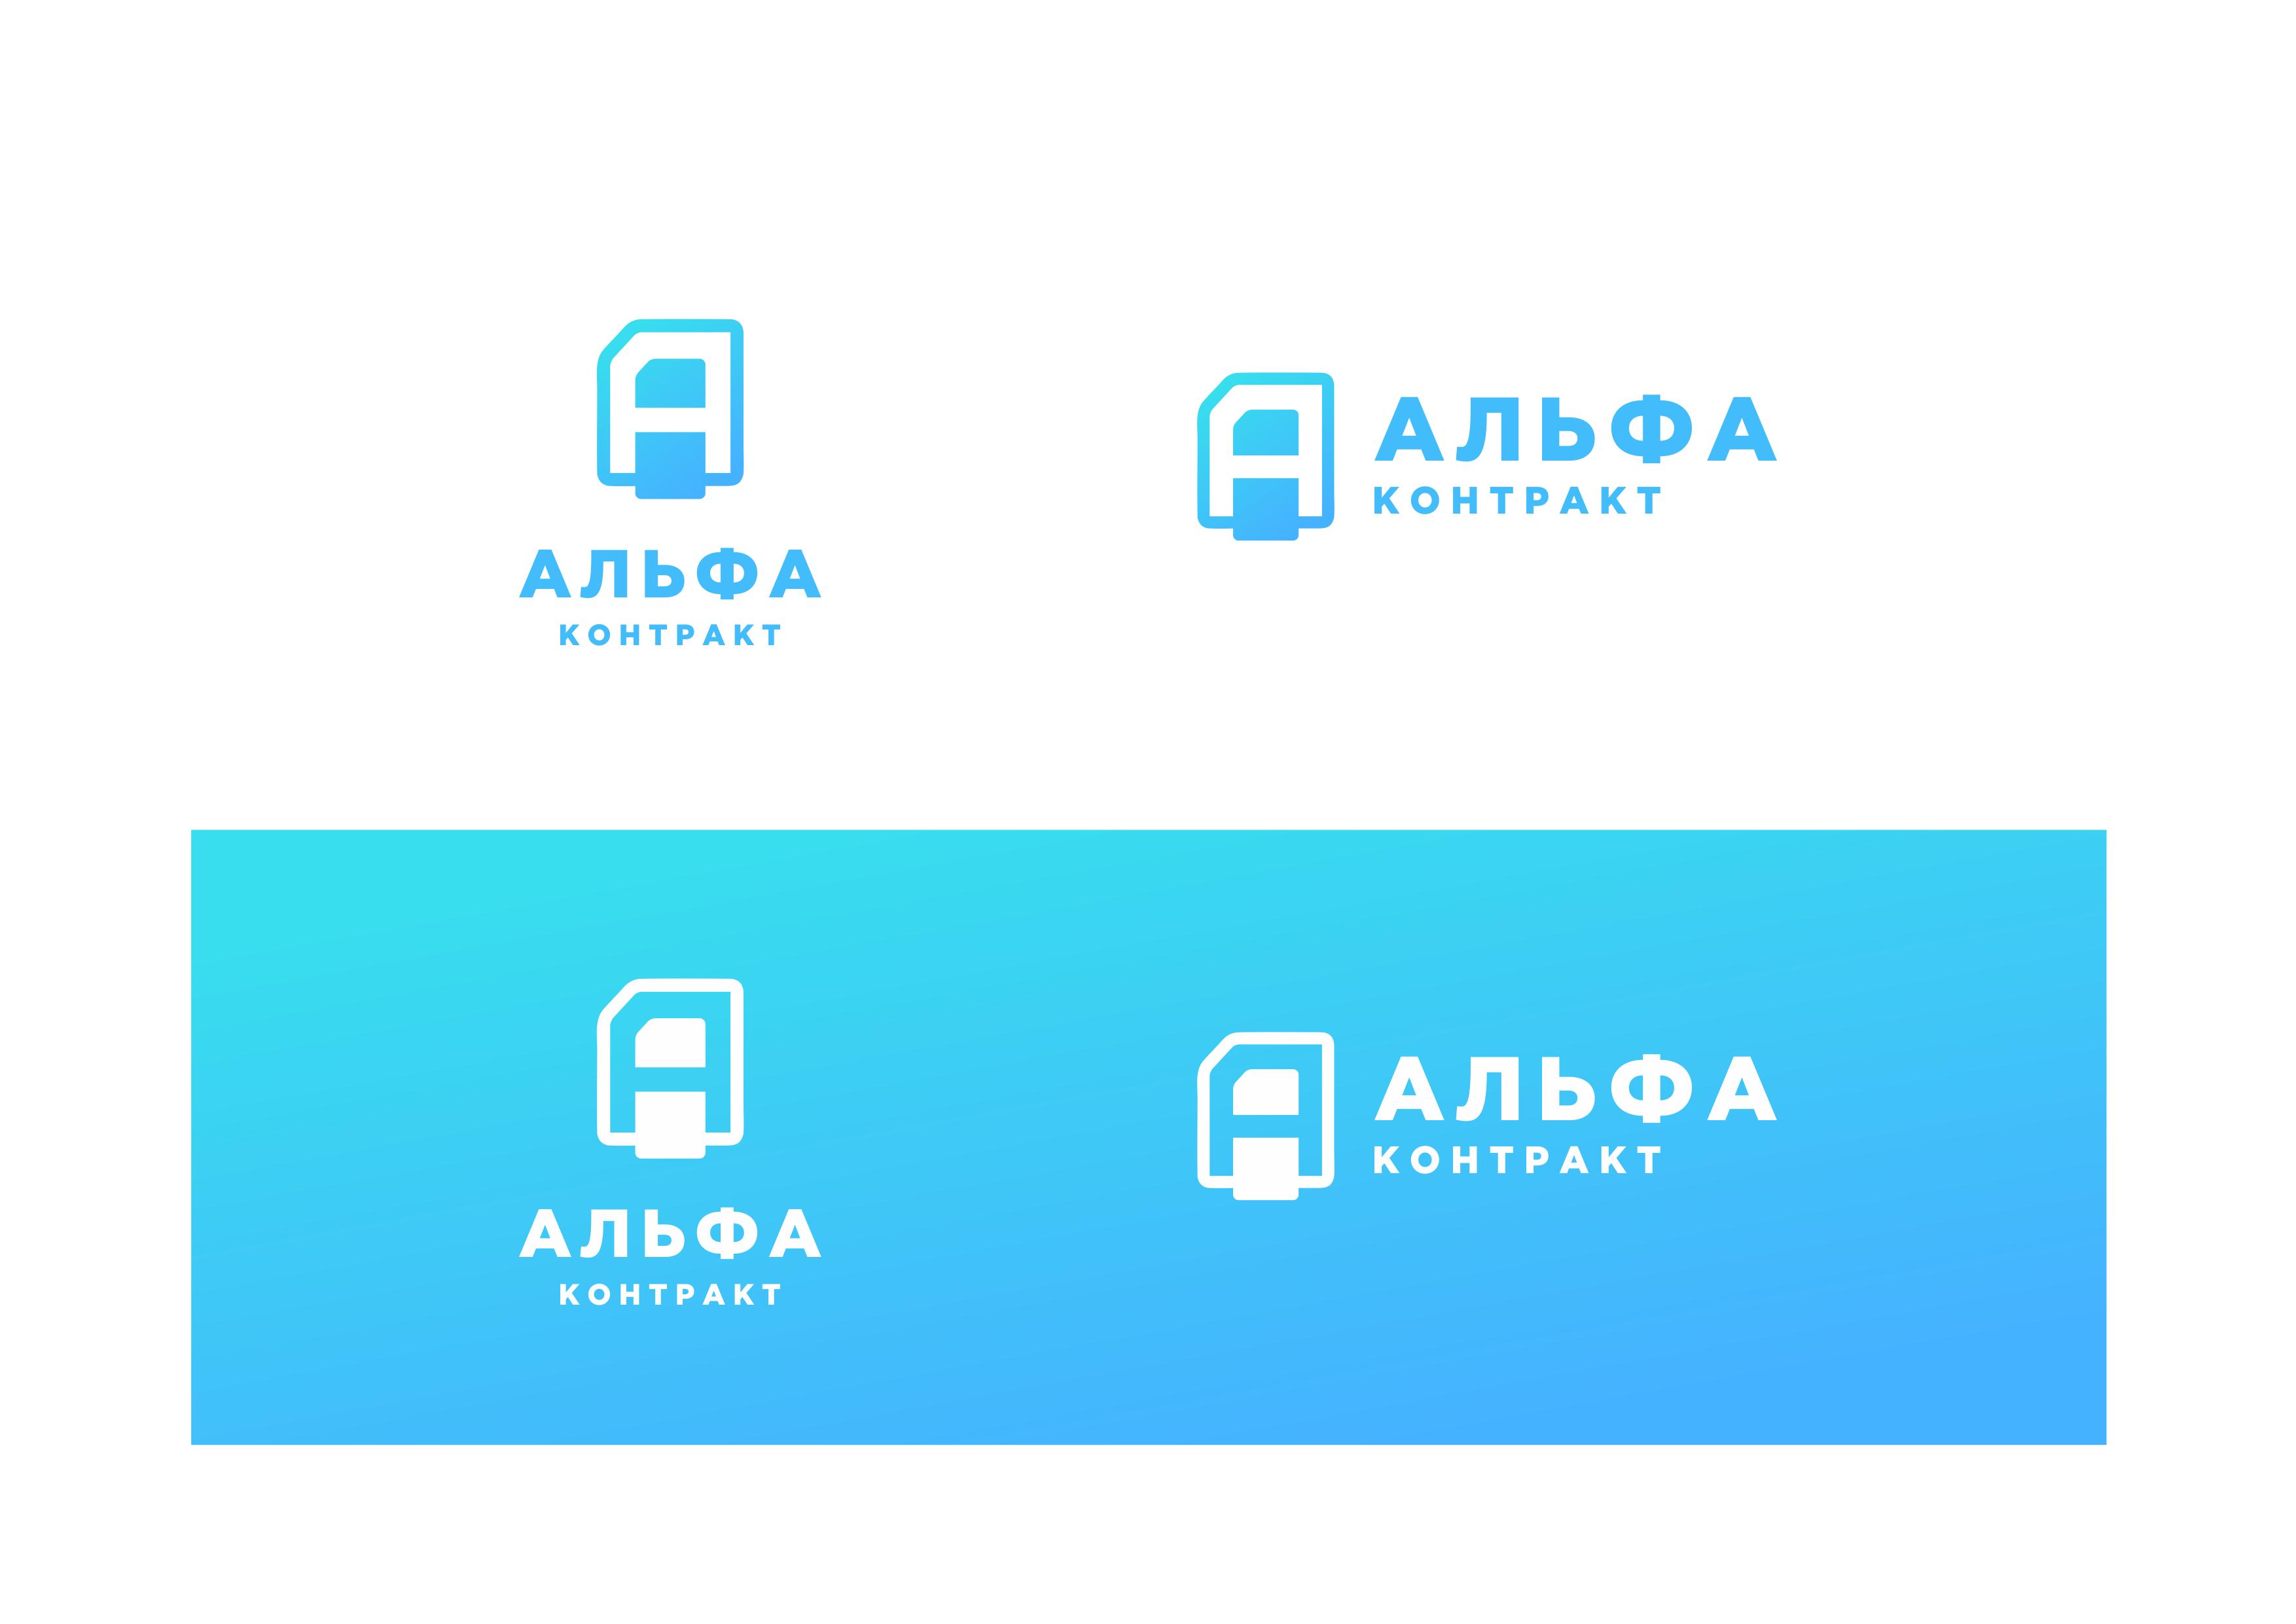 Дизайнер для разработки логотипа компании фото f_6305bf965780c00b.png